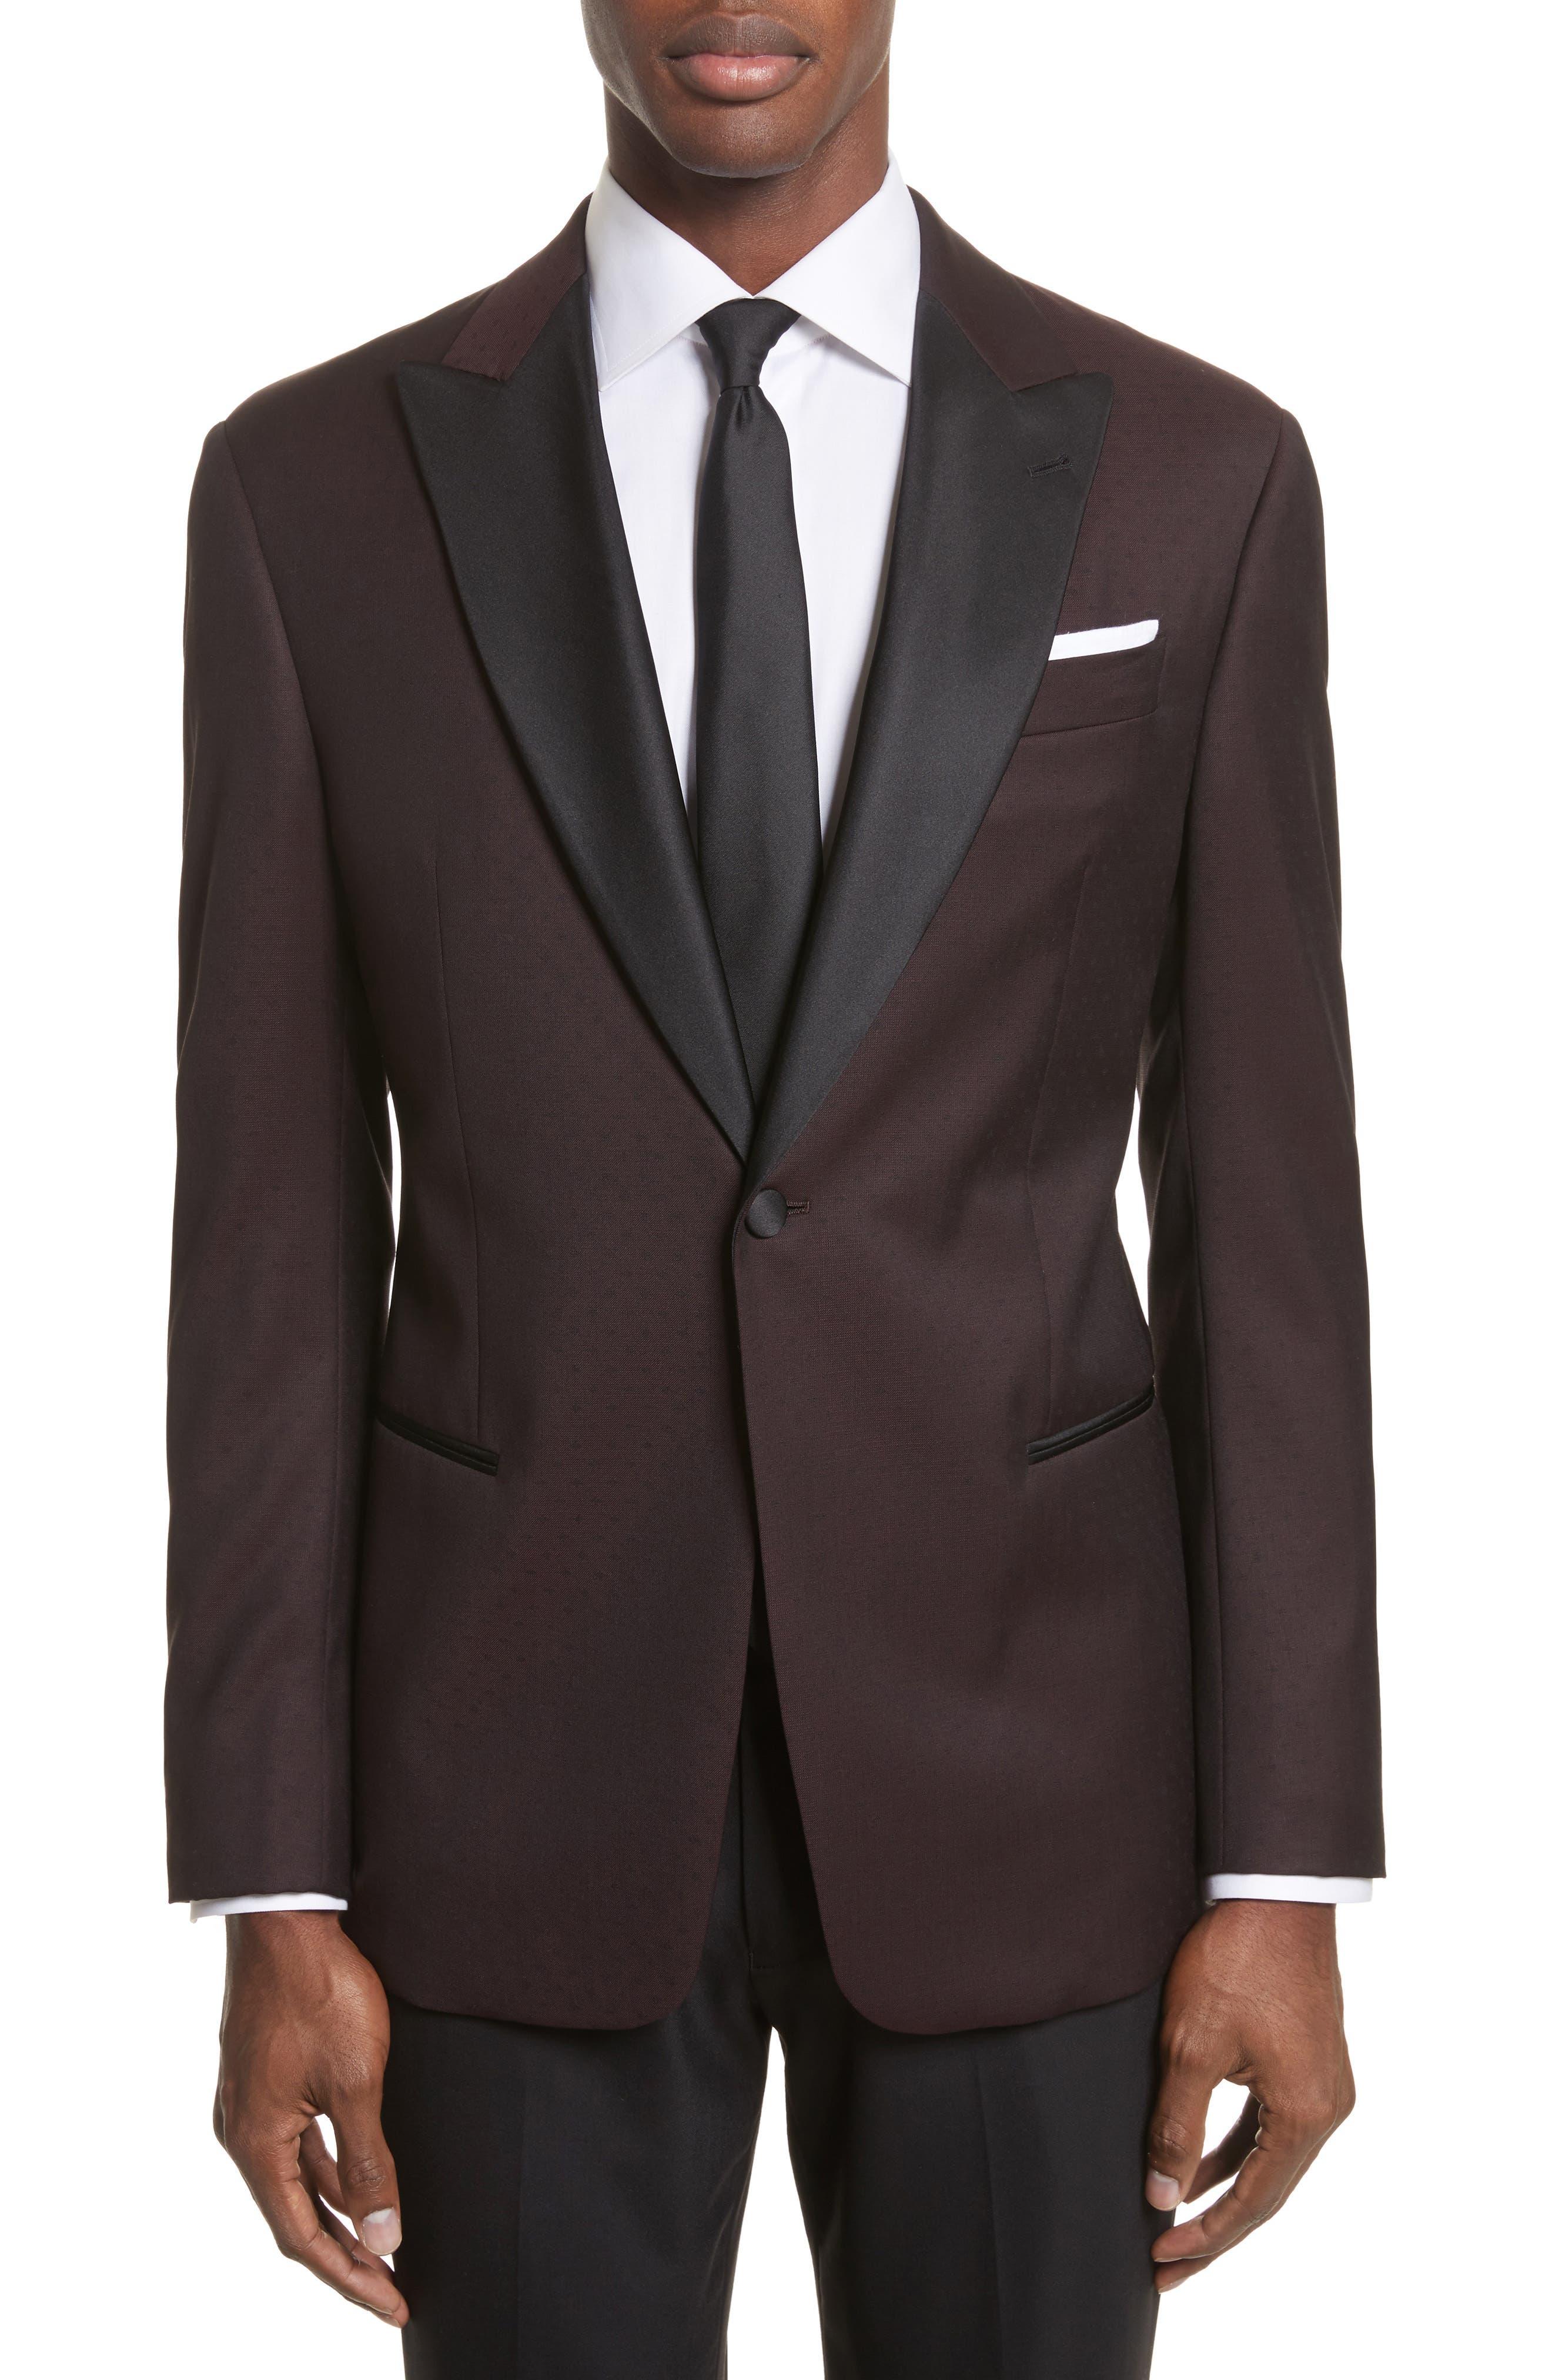 Main Image - Armani Collezioni Trim Fit Wool Dinner Jacket